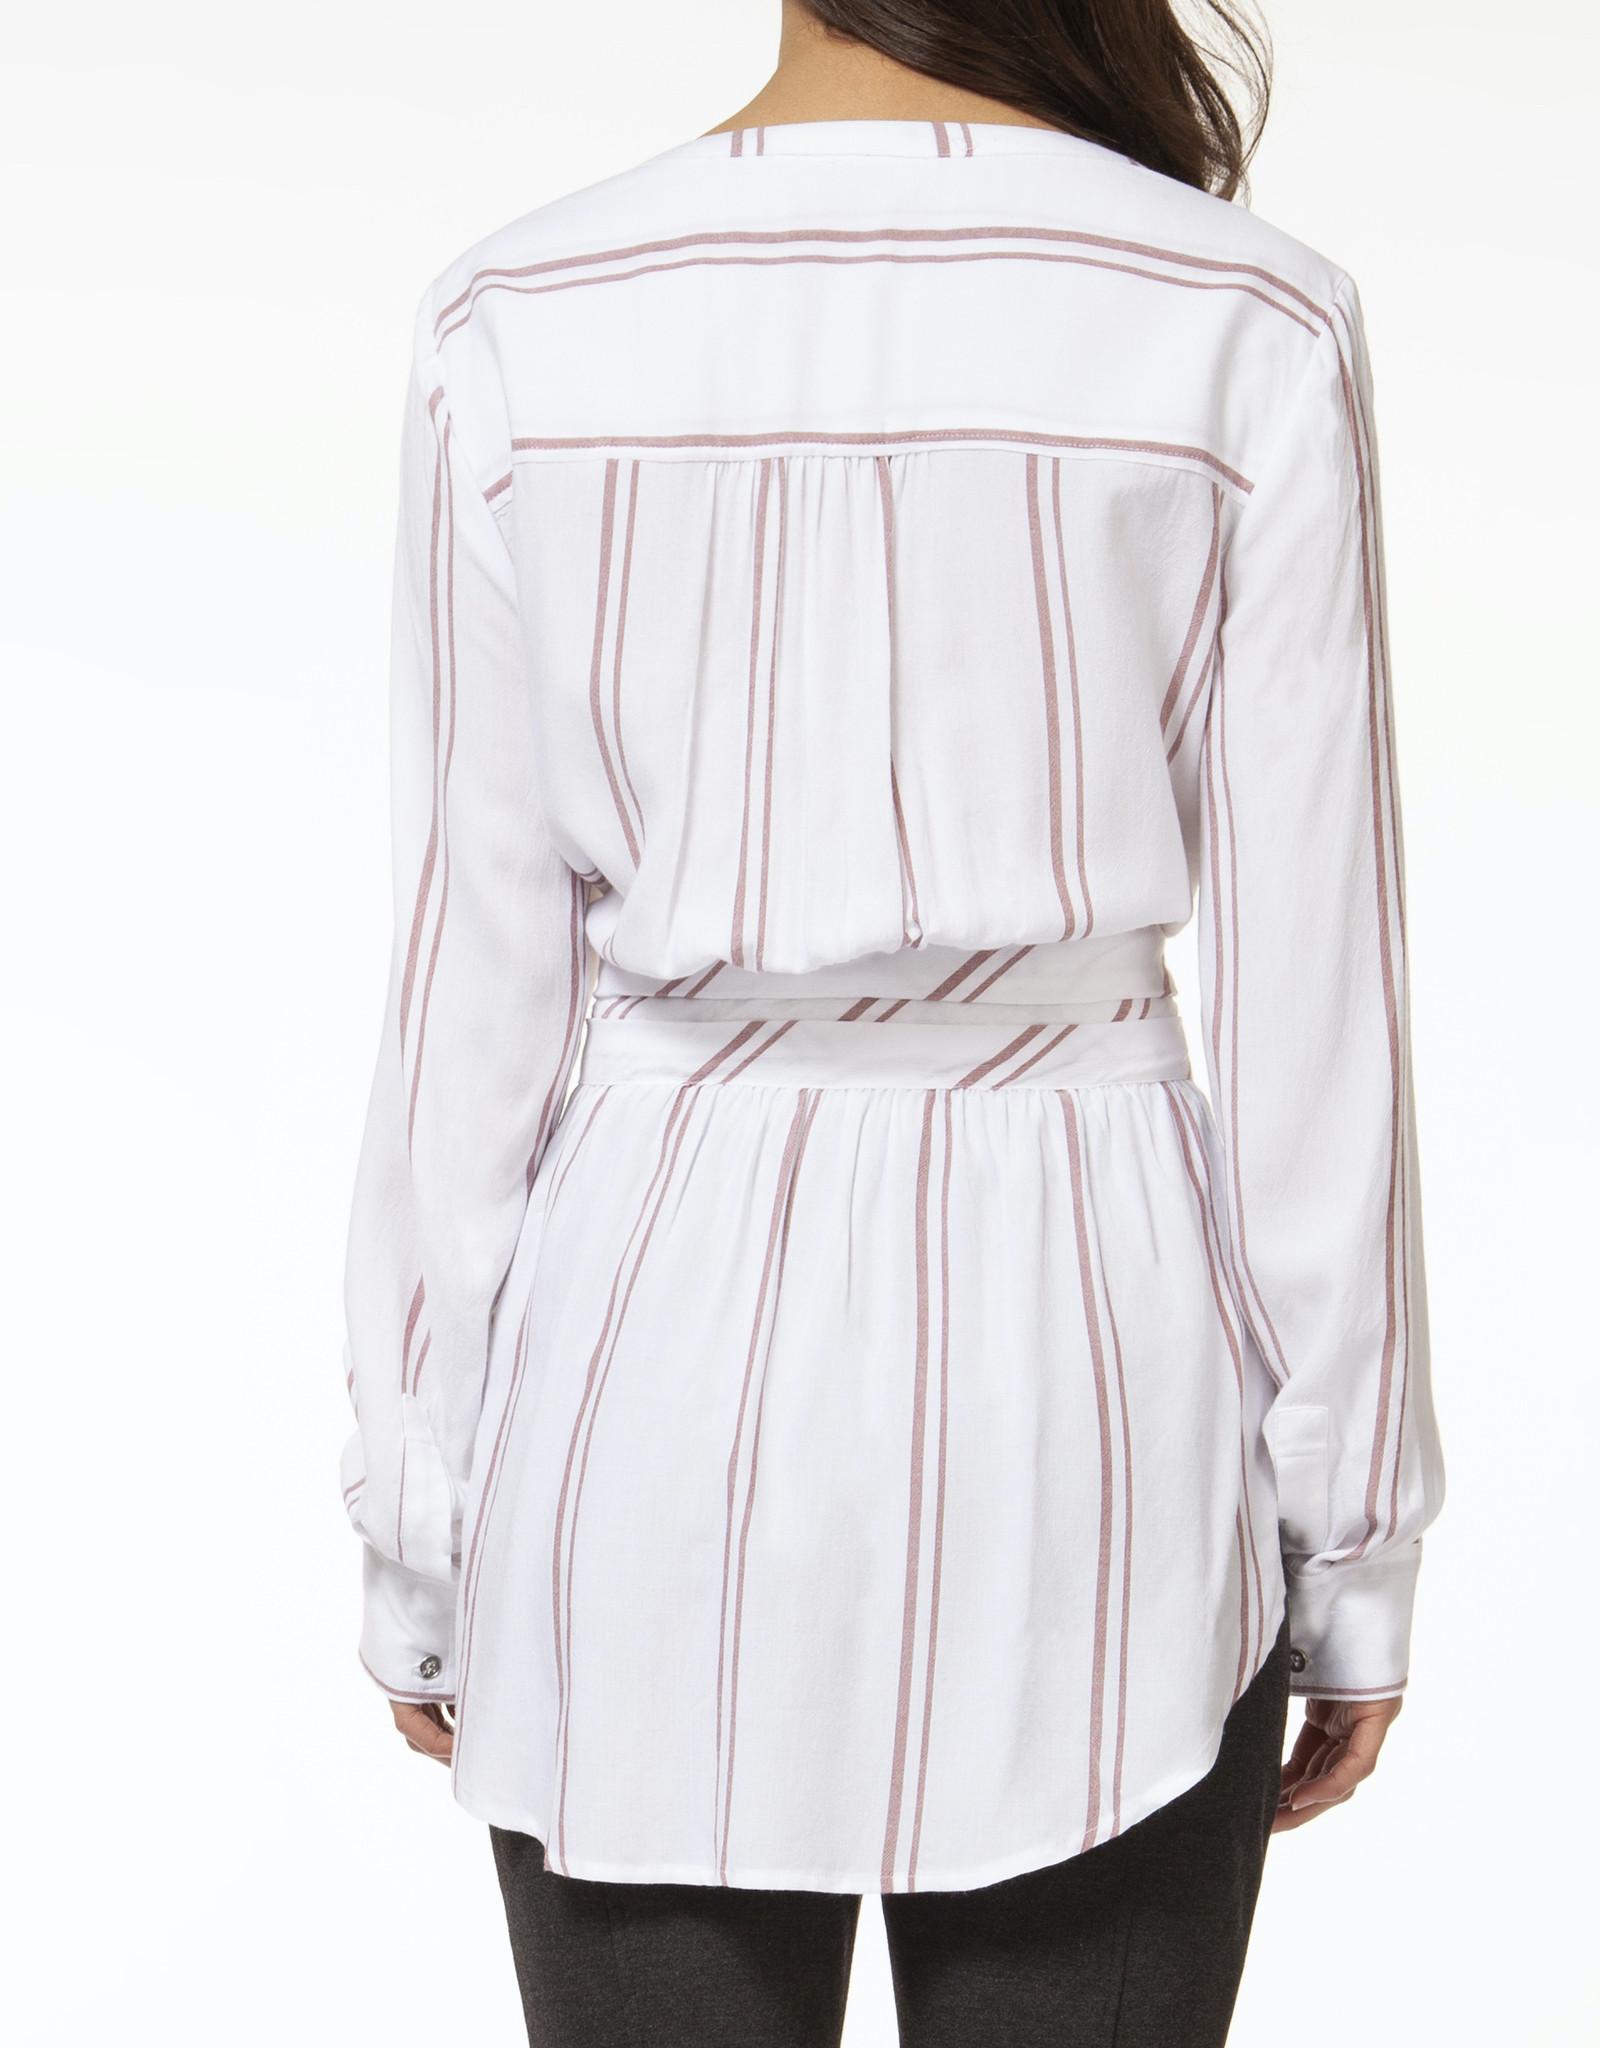 Black Tape Stripe Tunic with Belt Detail